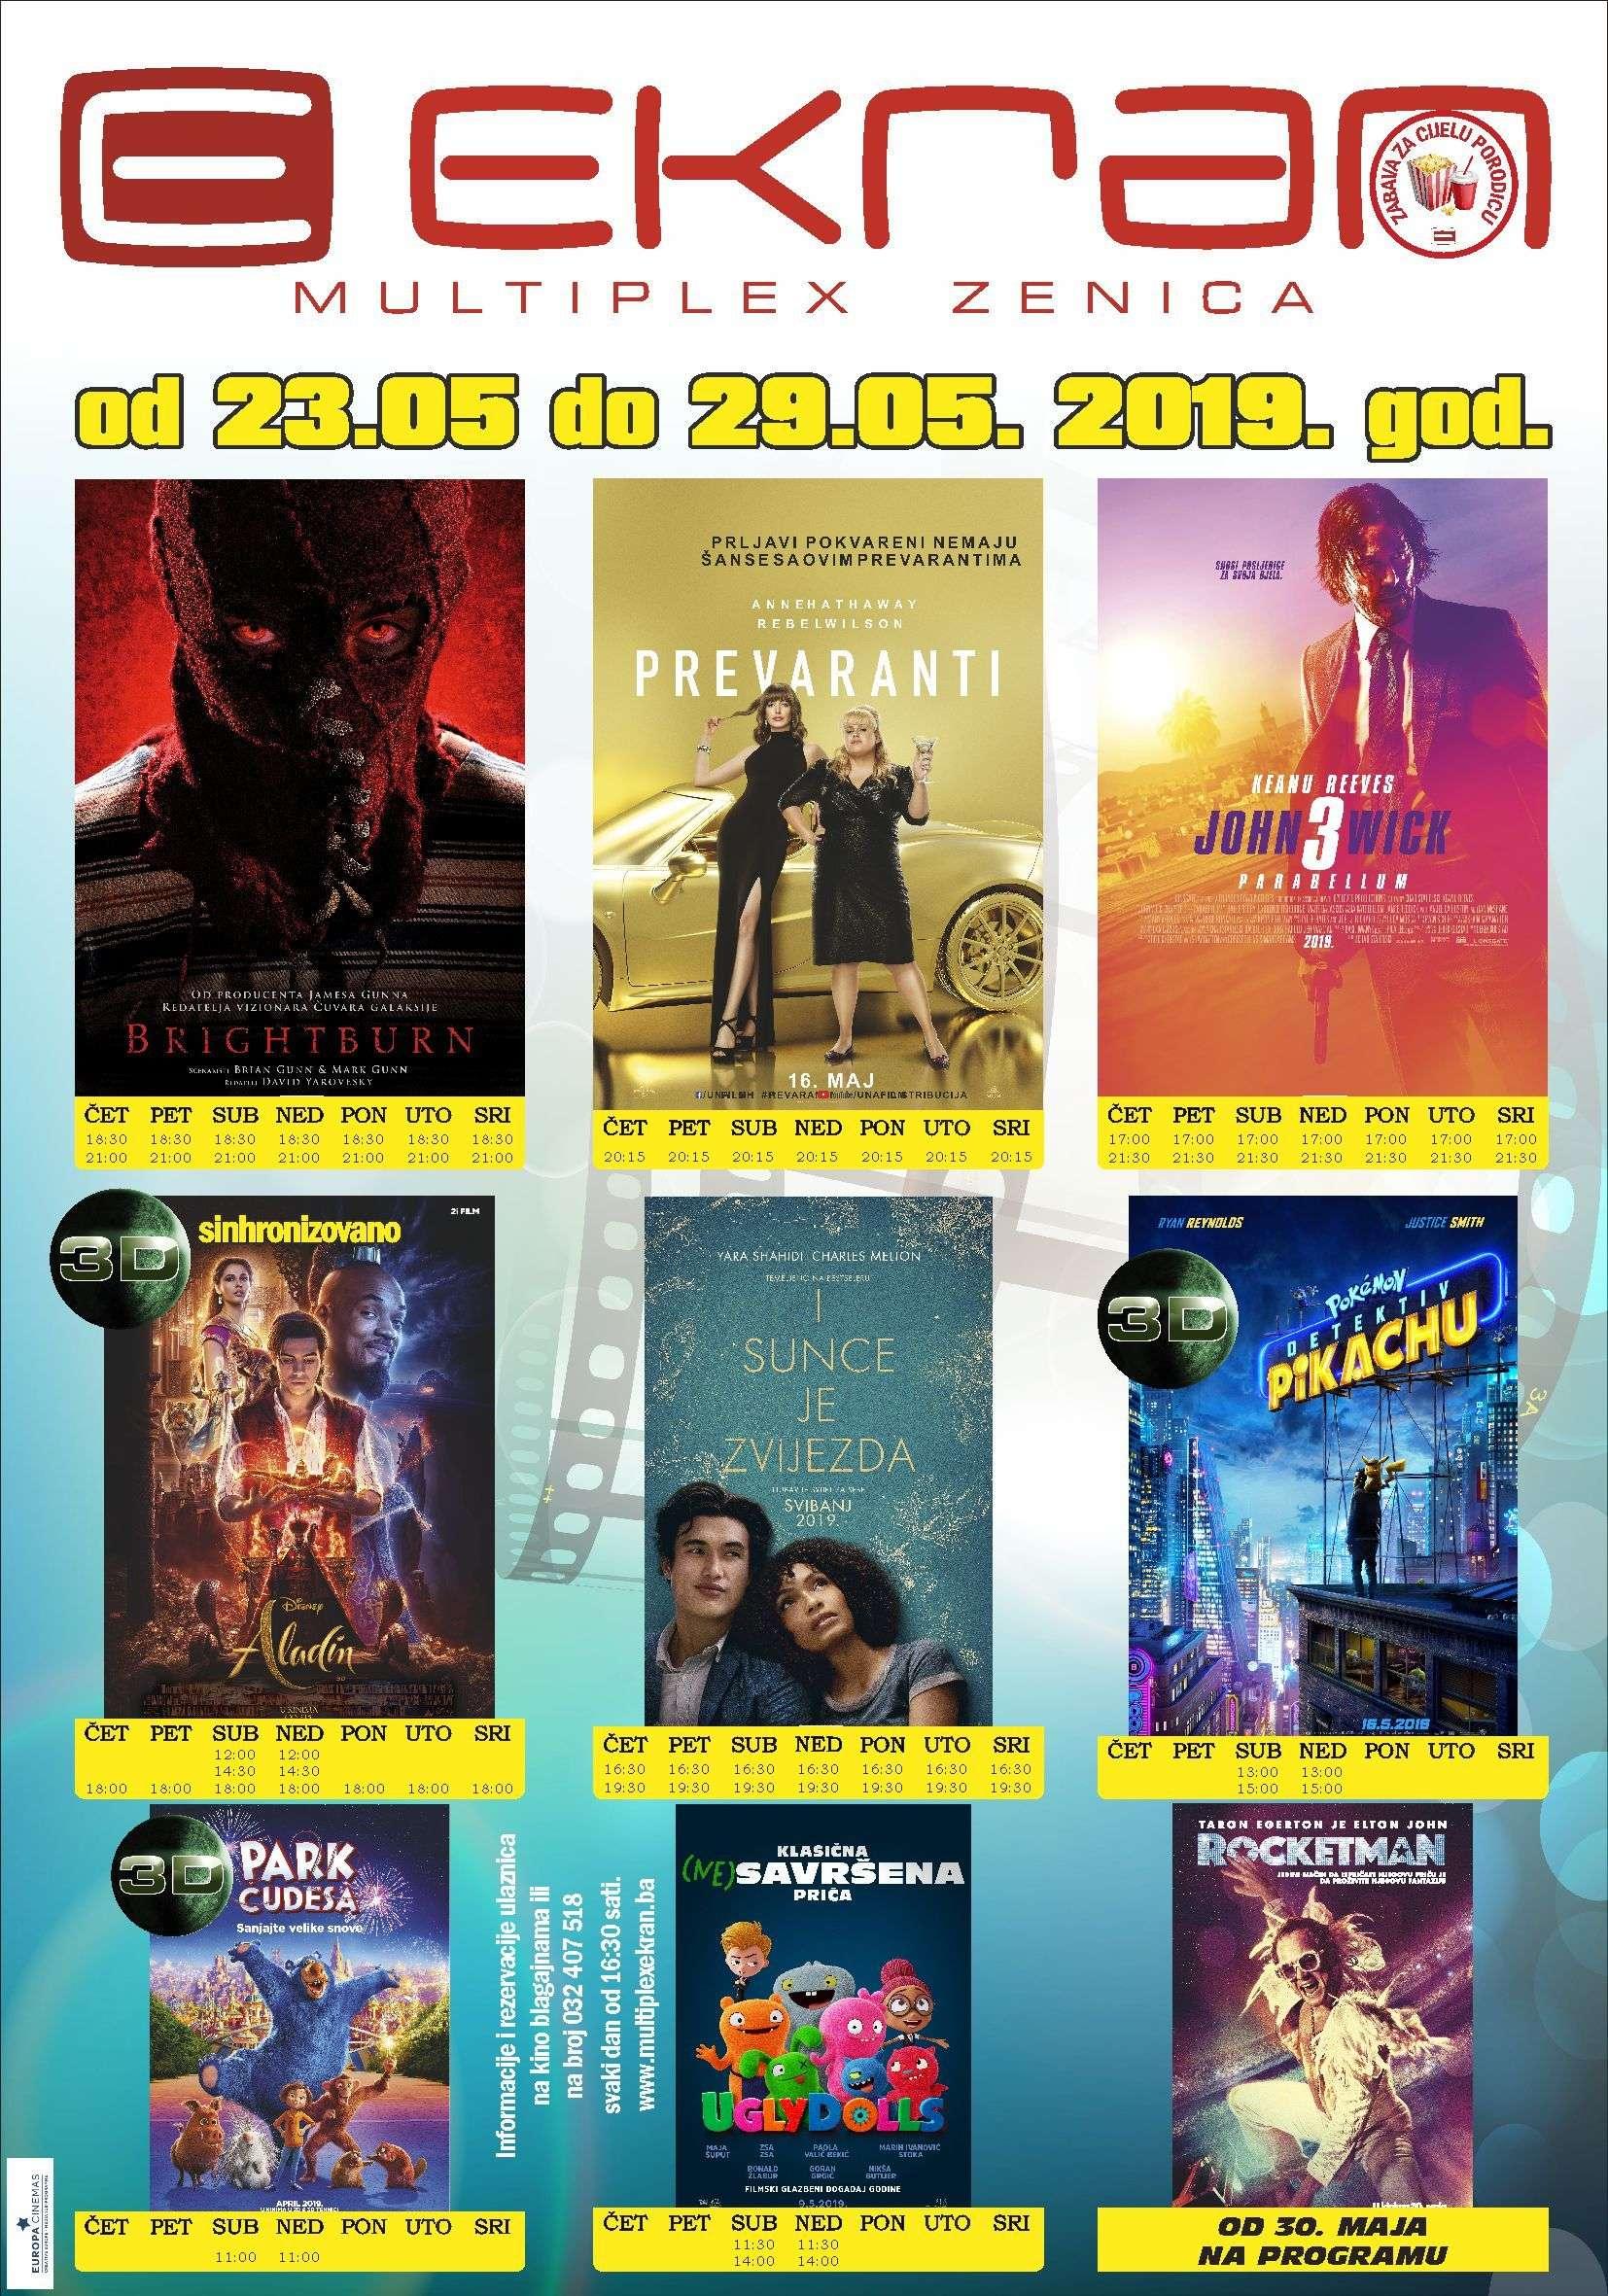 "sf horor ""brightburn"", romantična drama ""i sunce je zvijezda"" i avantura ""aladin"" novi filmovi na programu multiplexa ""ekran"" zenica"